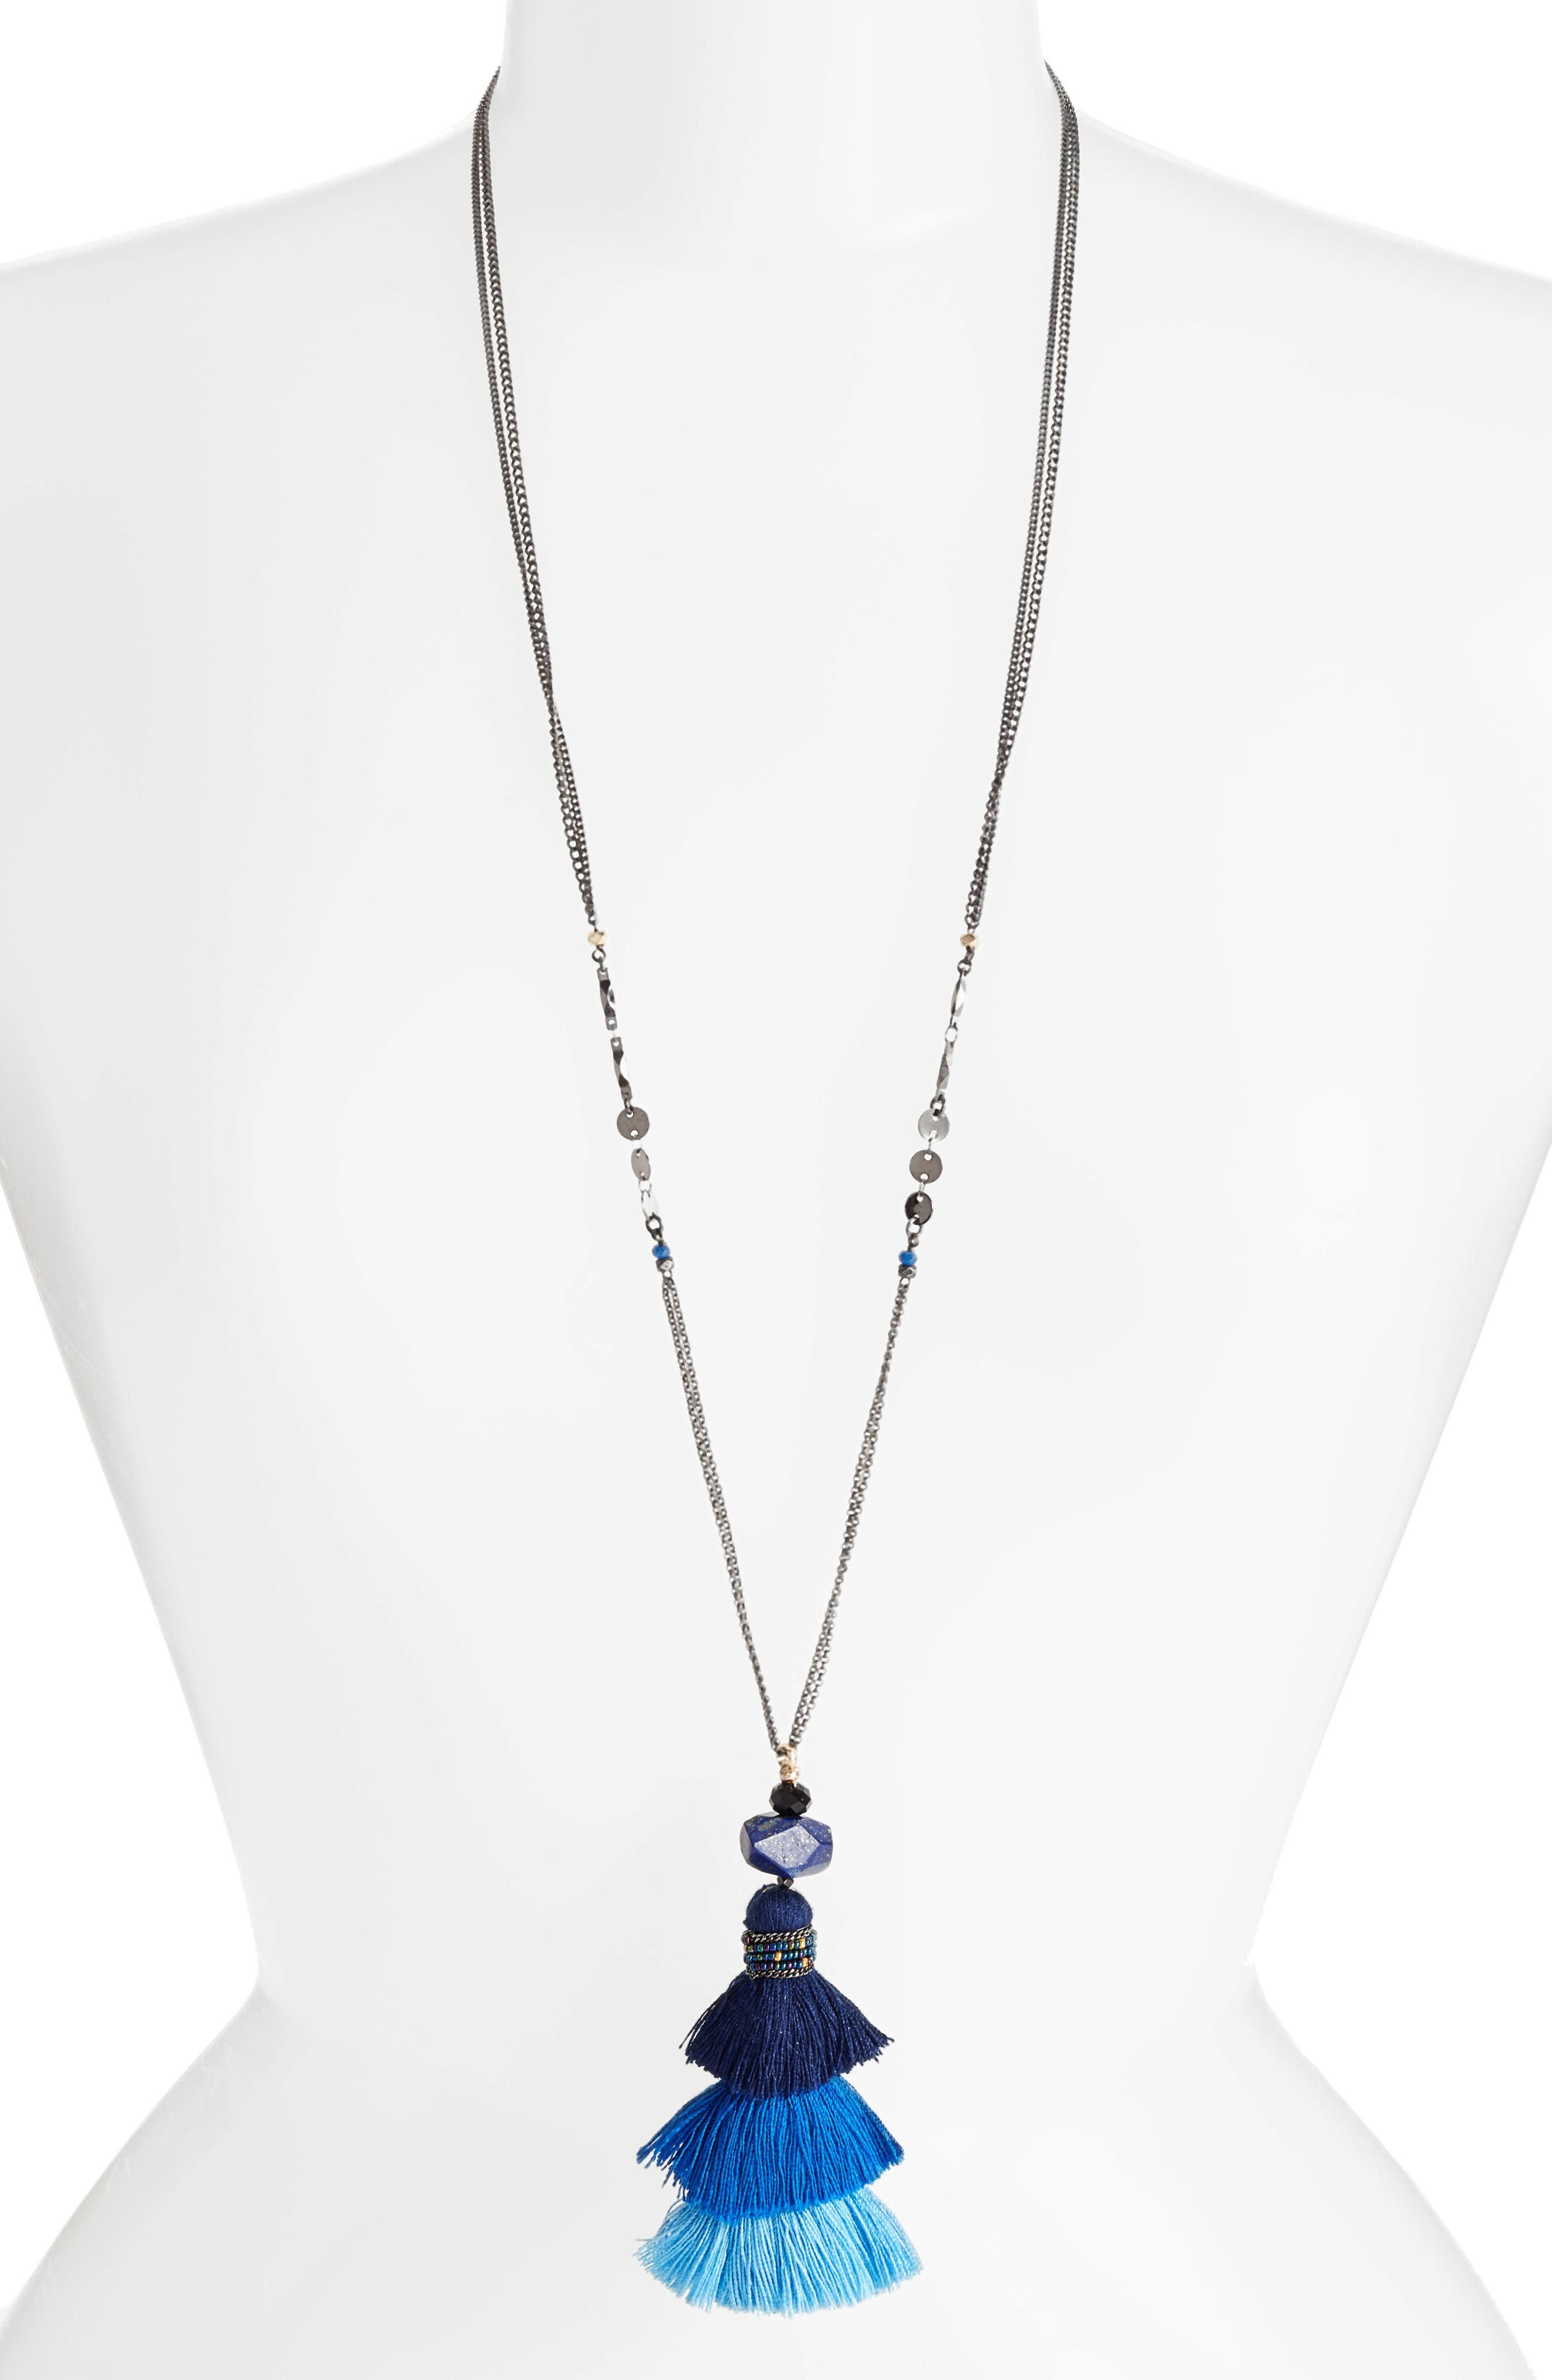 Nakamol Design Layered Tassel Necklace